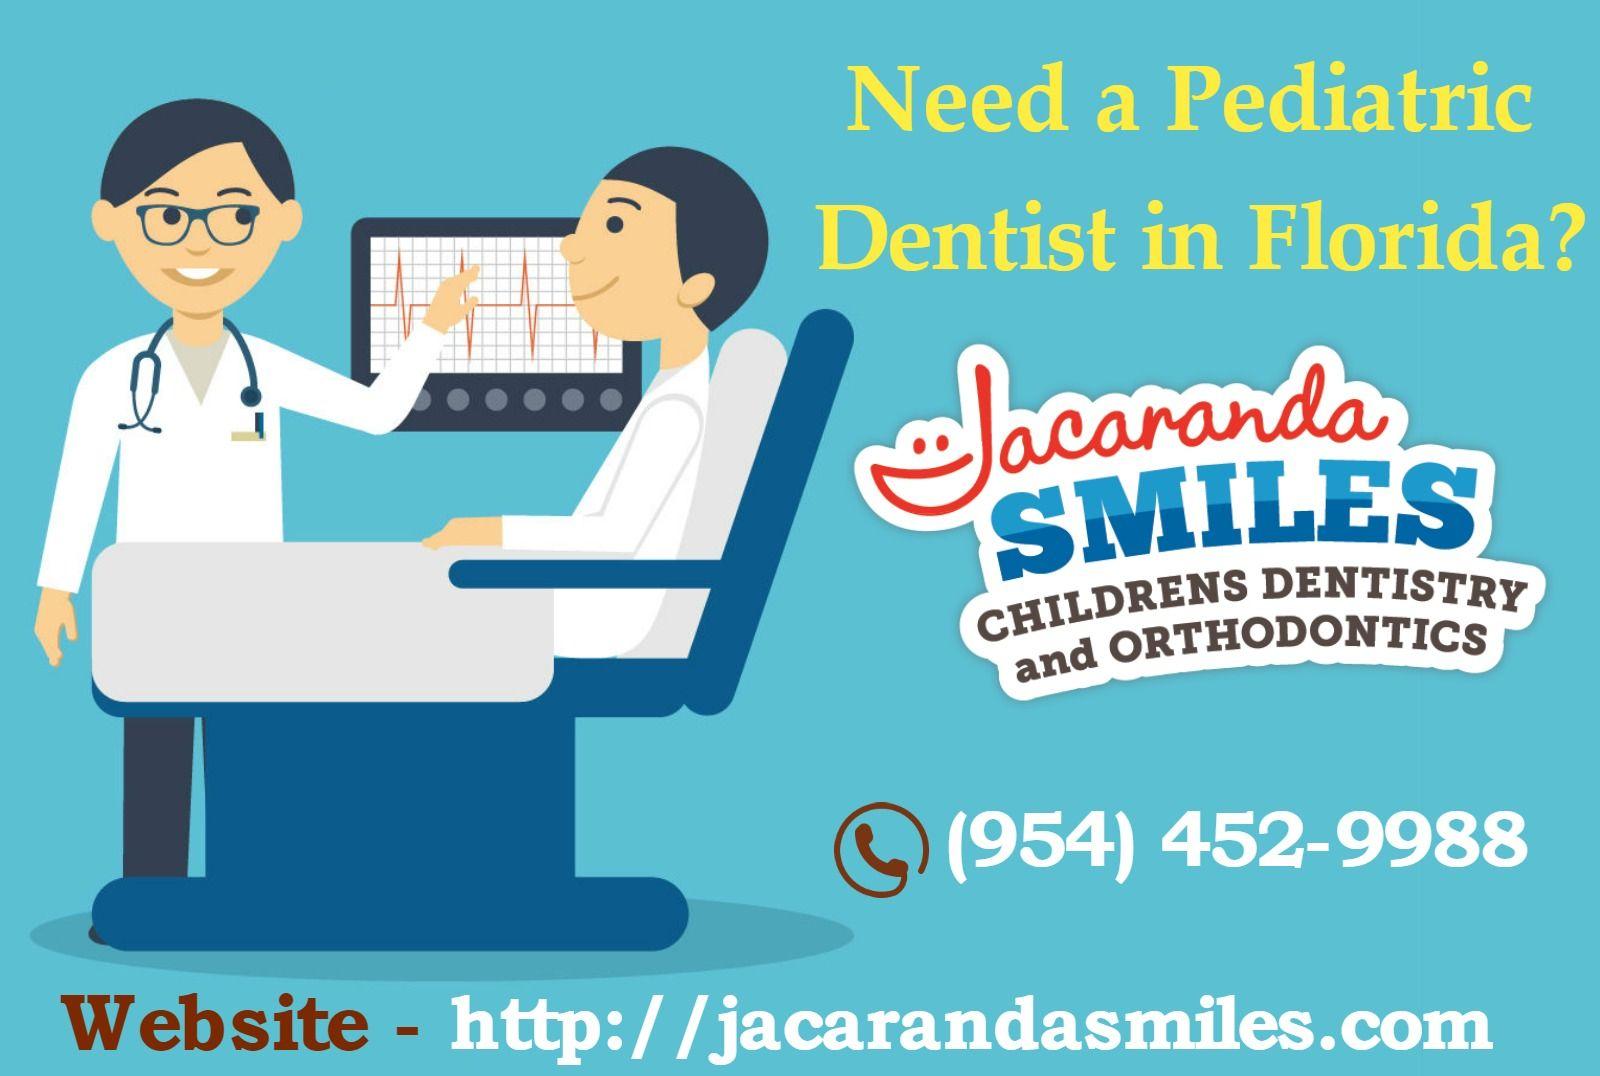 Need a Pediatric Dentist in Florida? Kids dentist